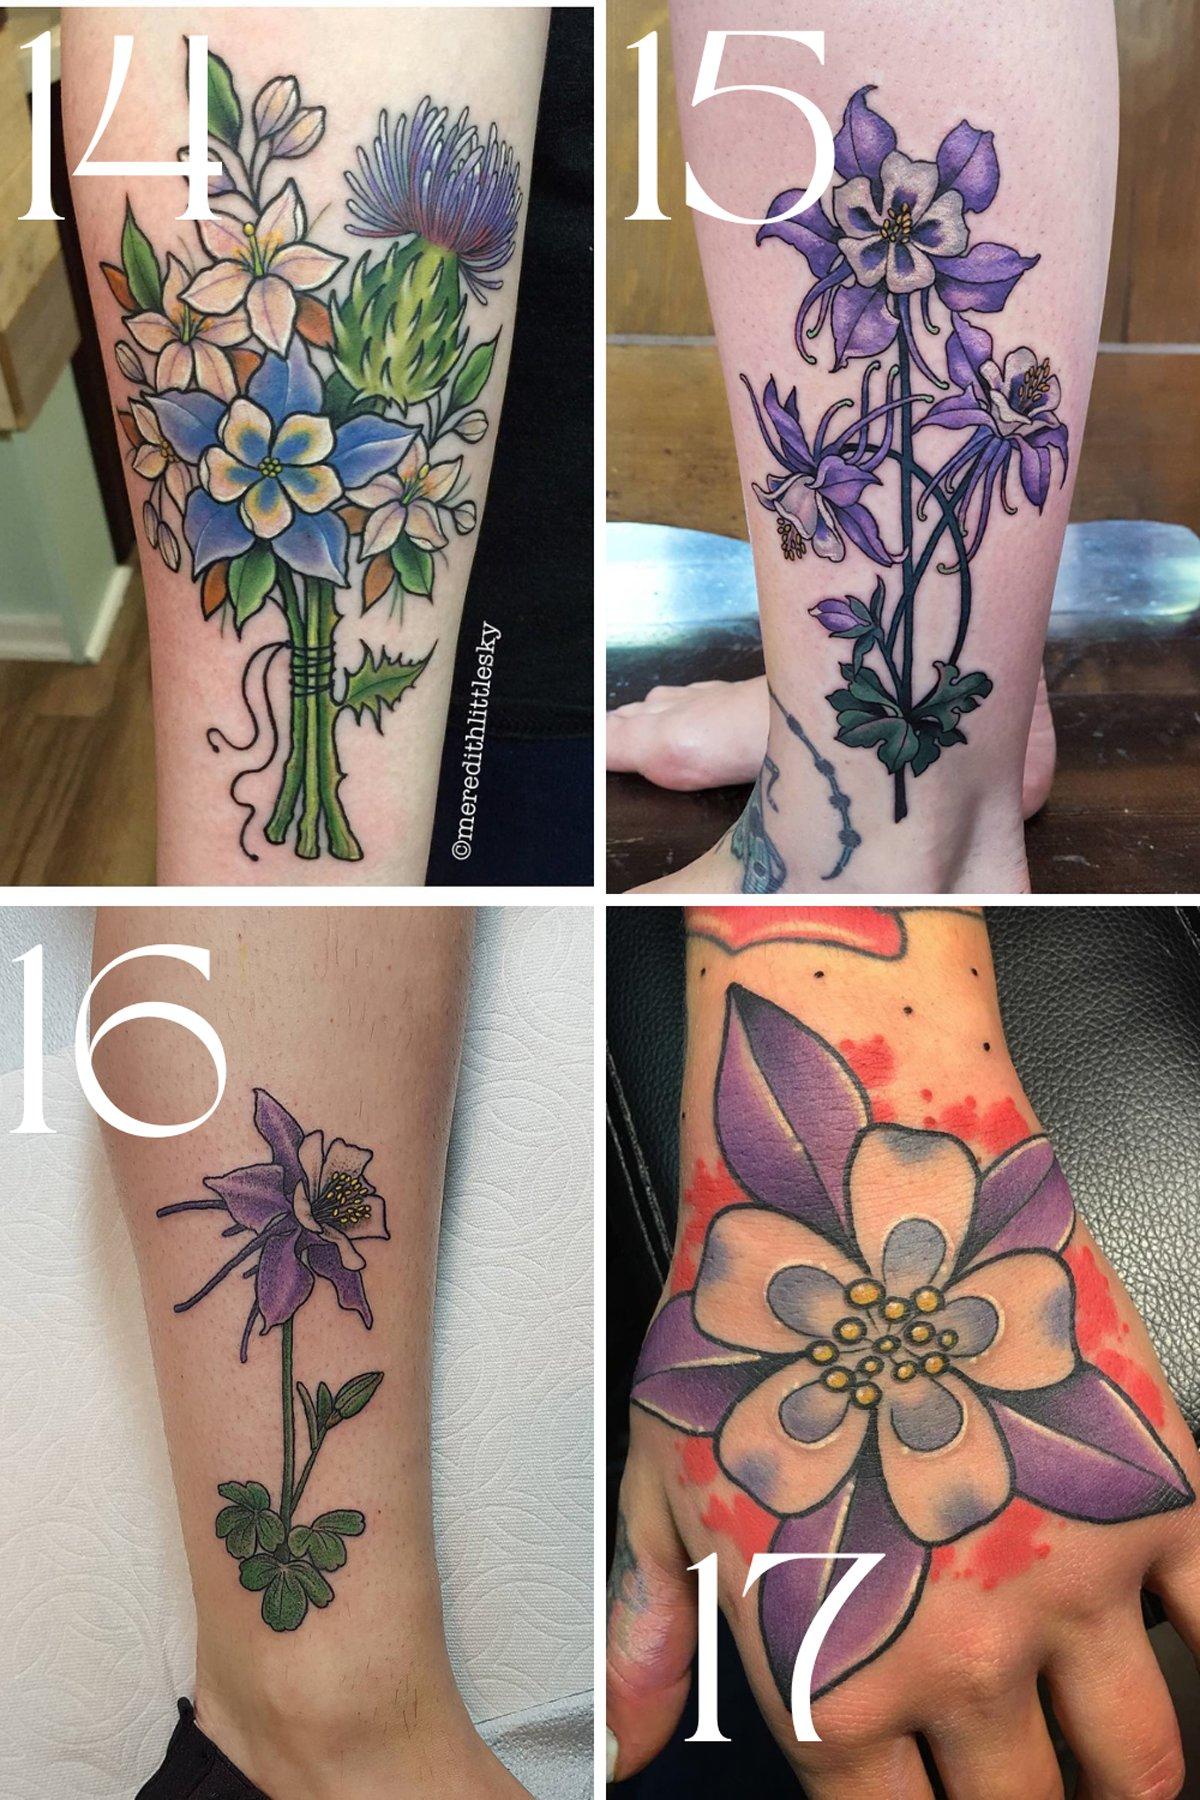 Columbine Flower Tattoo Designs